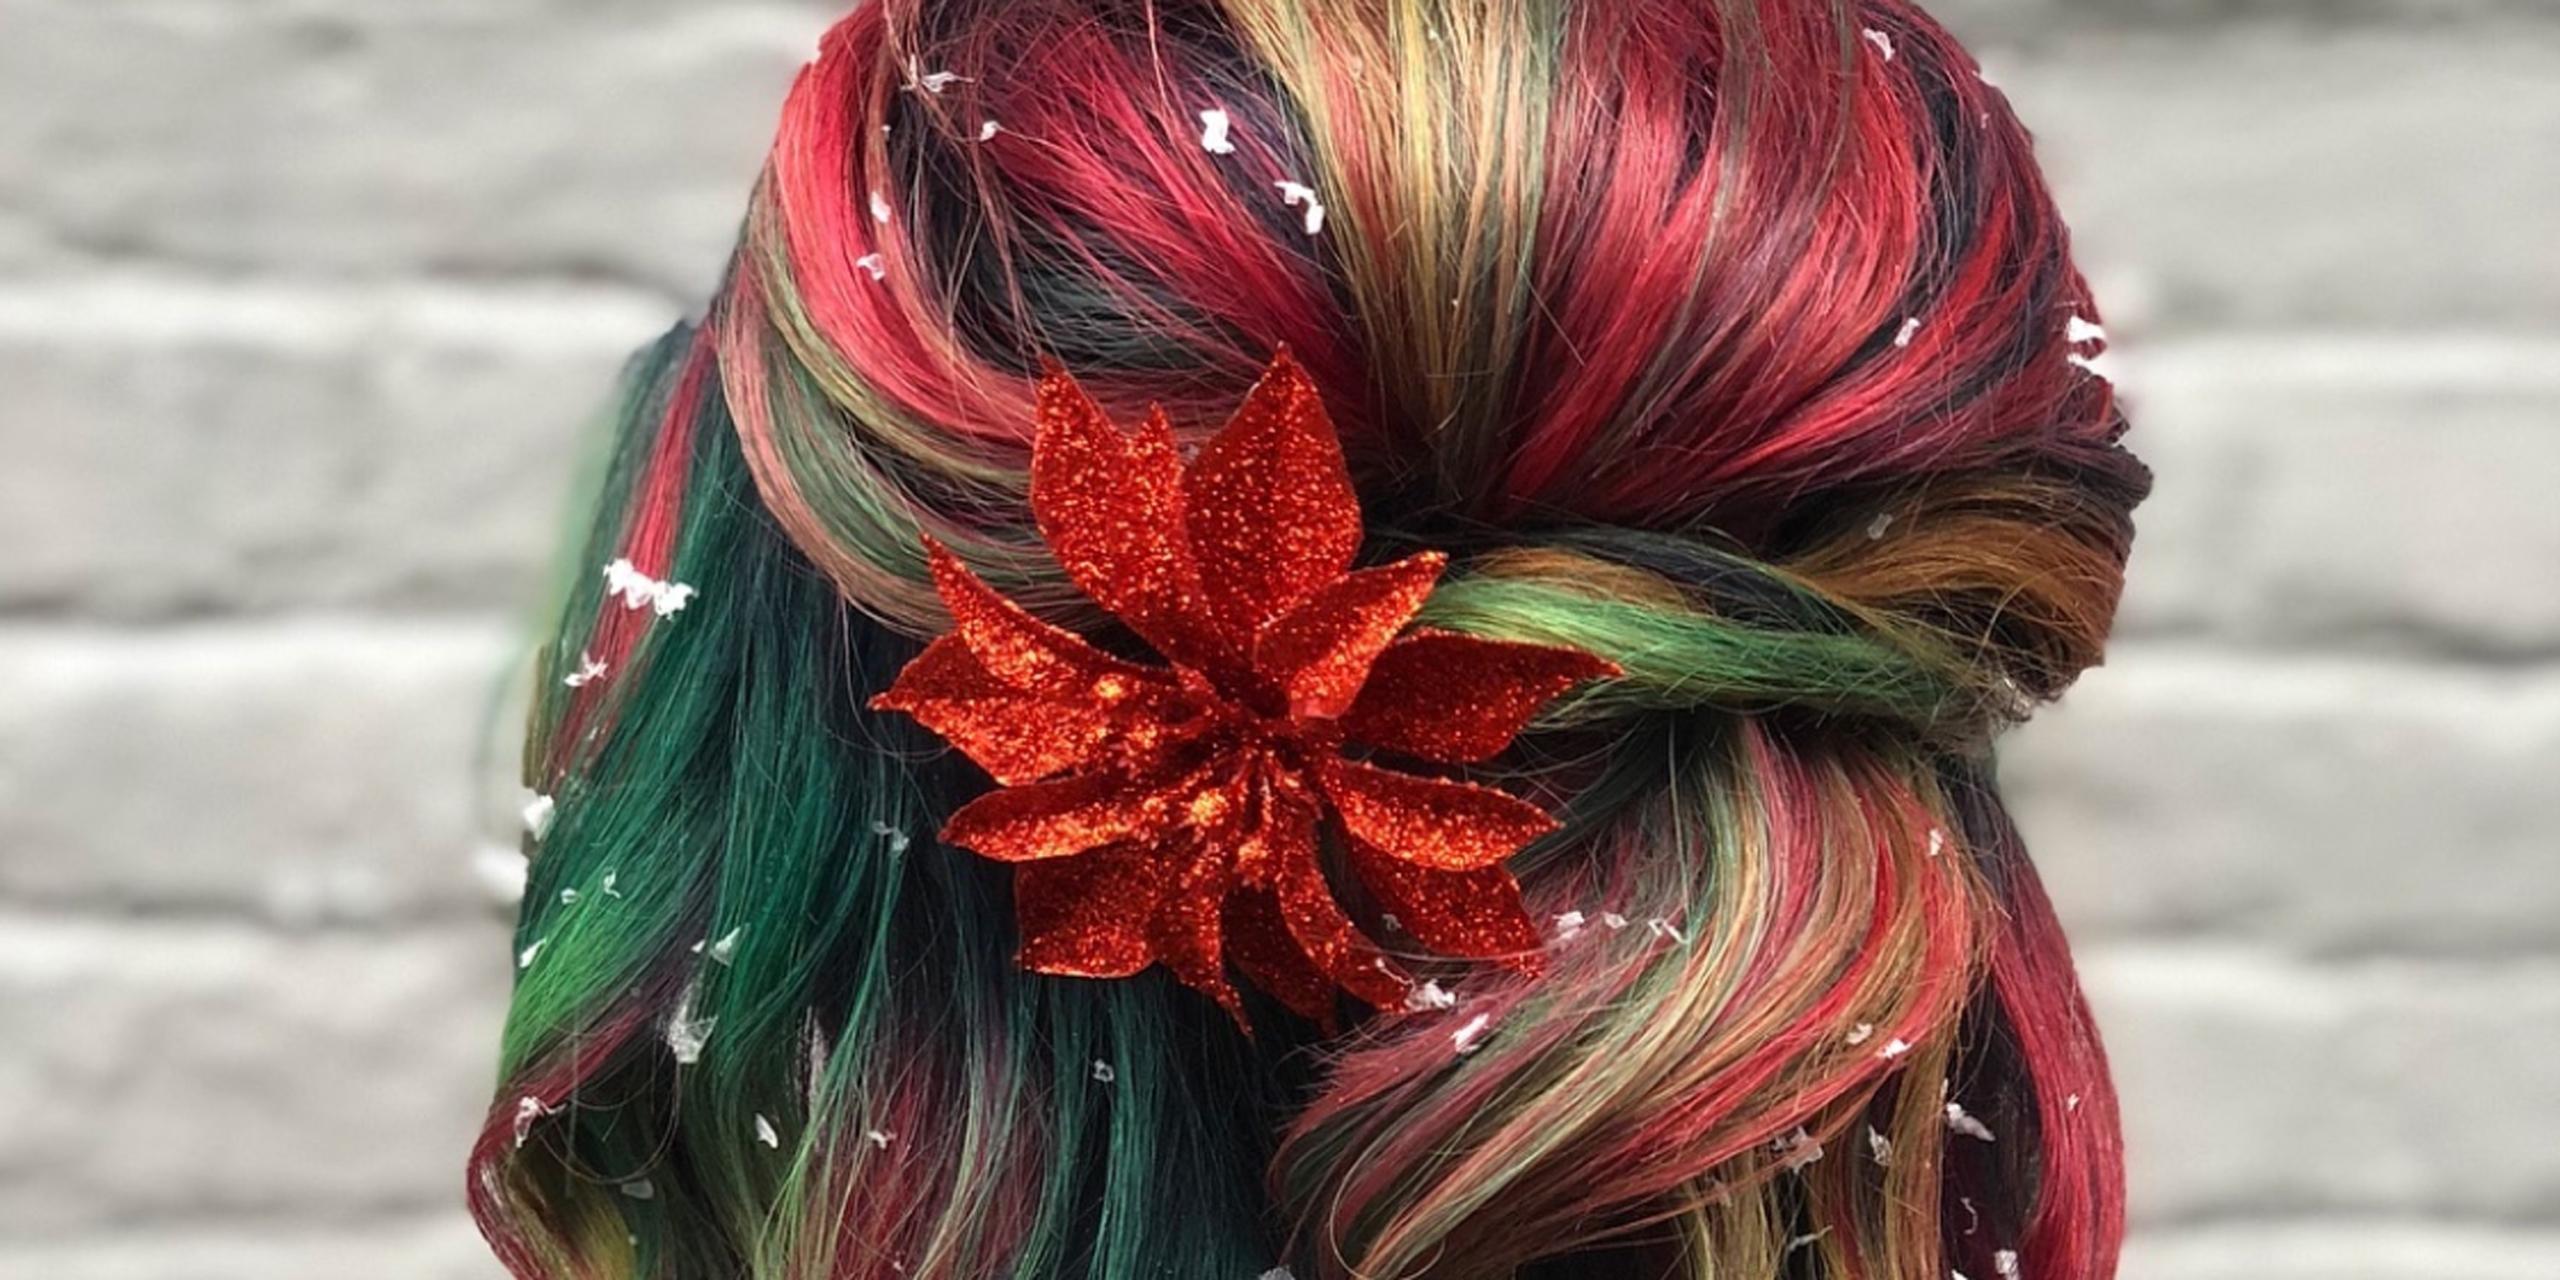 Some Christmas Hair Design Ideas